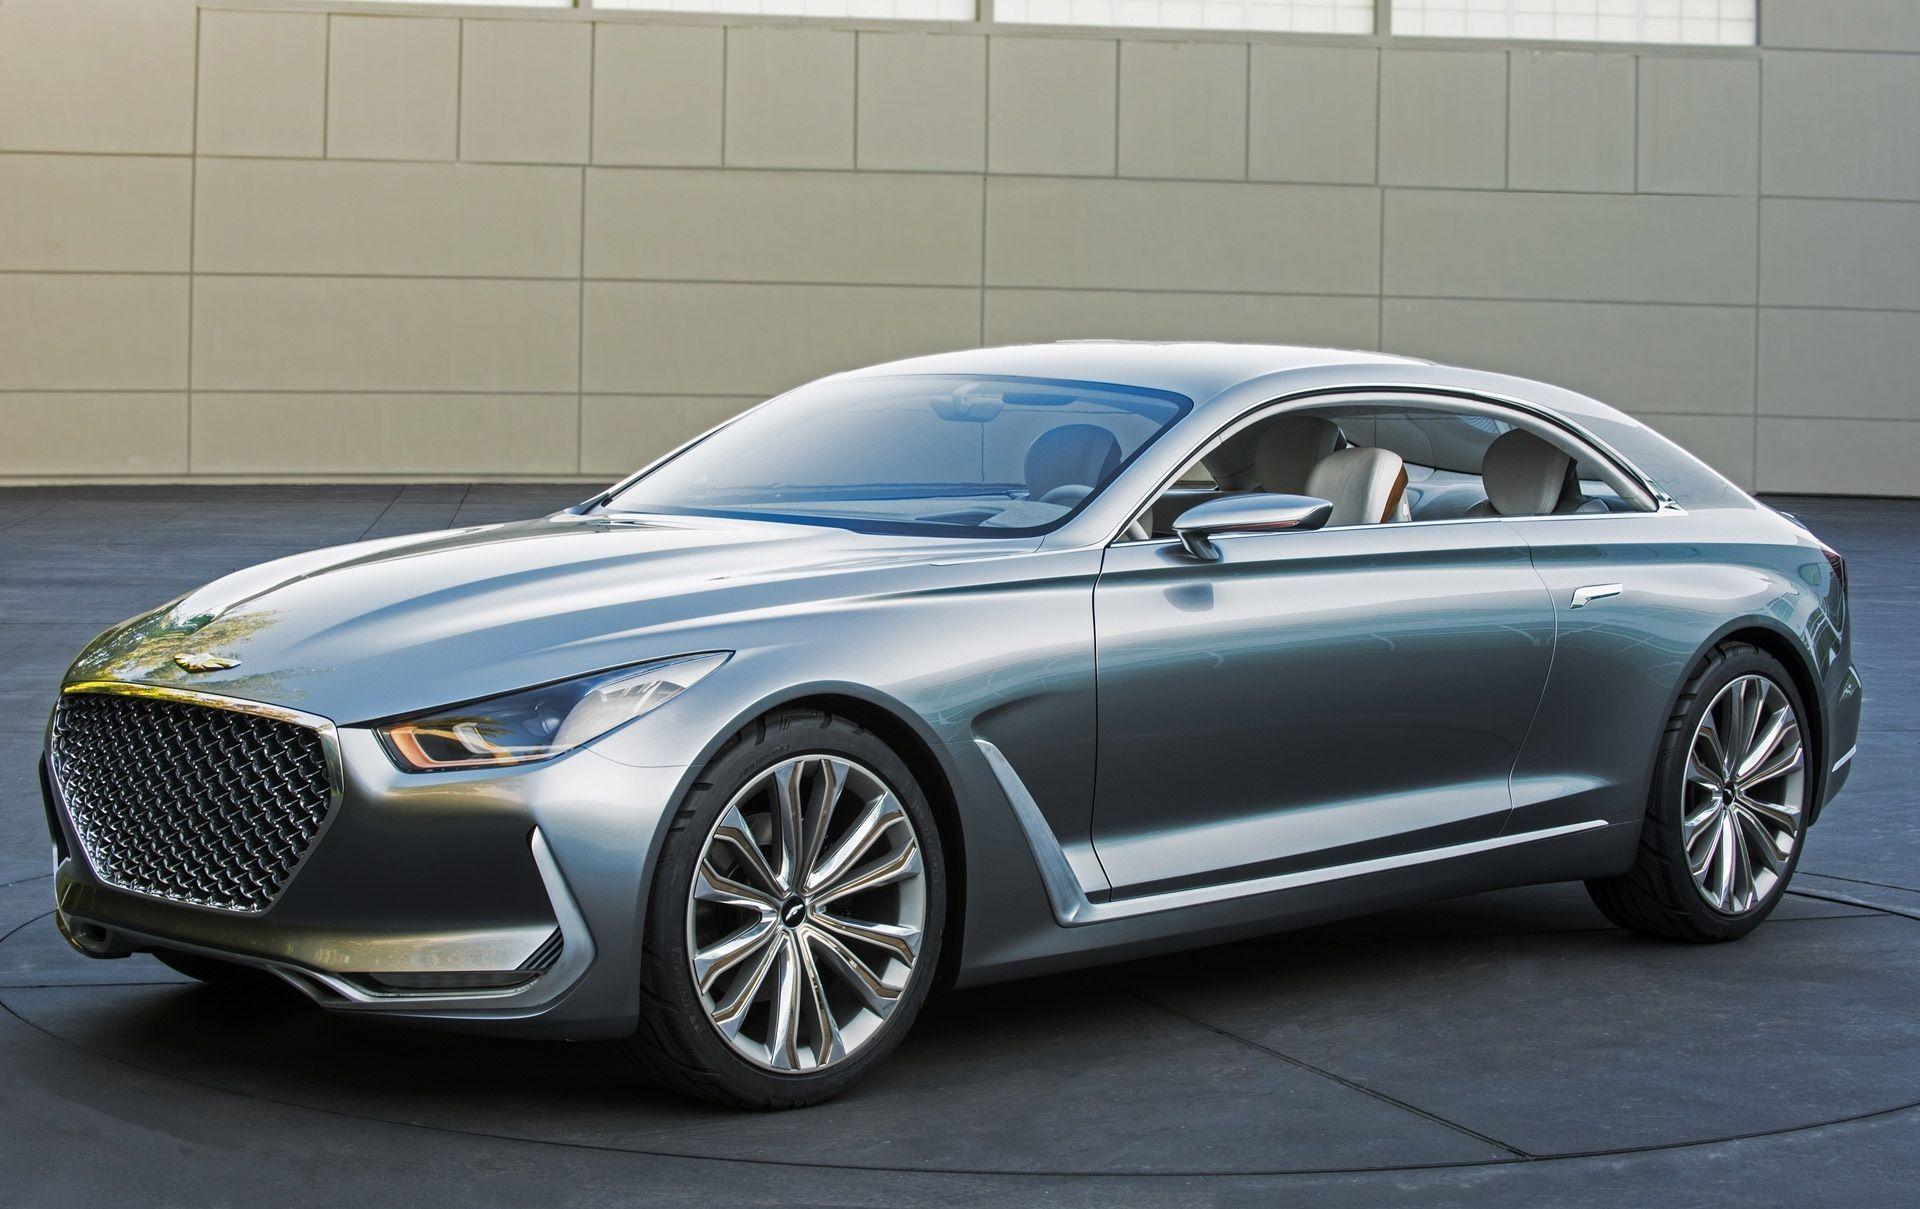 News On 2021 Genesis G60 Bmw 3 Series Convertible Hyundai Genesis Coupe Bmw 3 Series